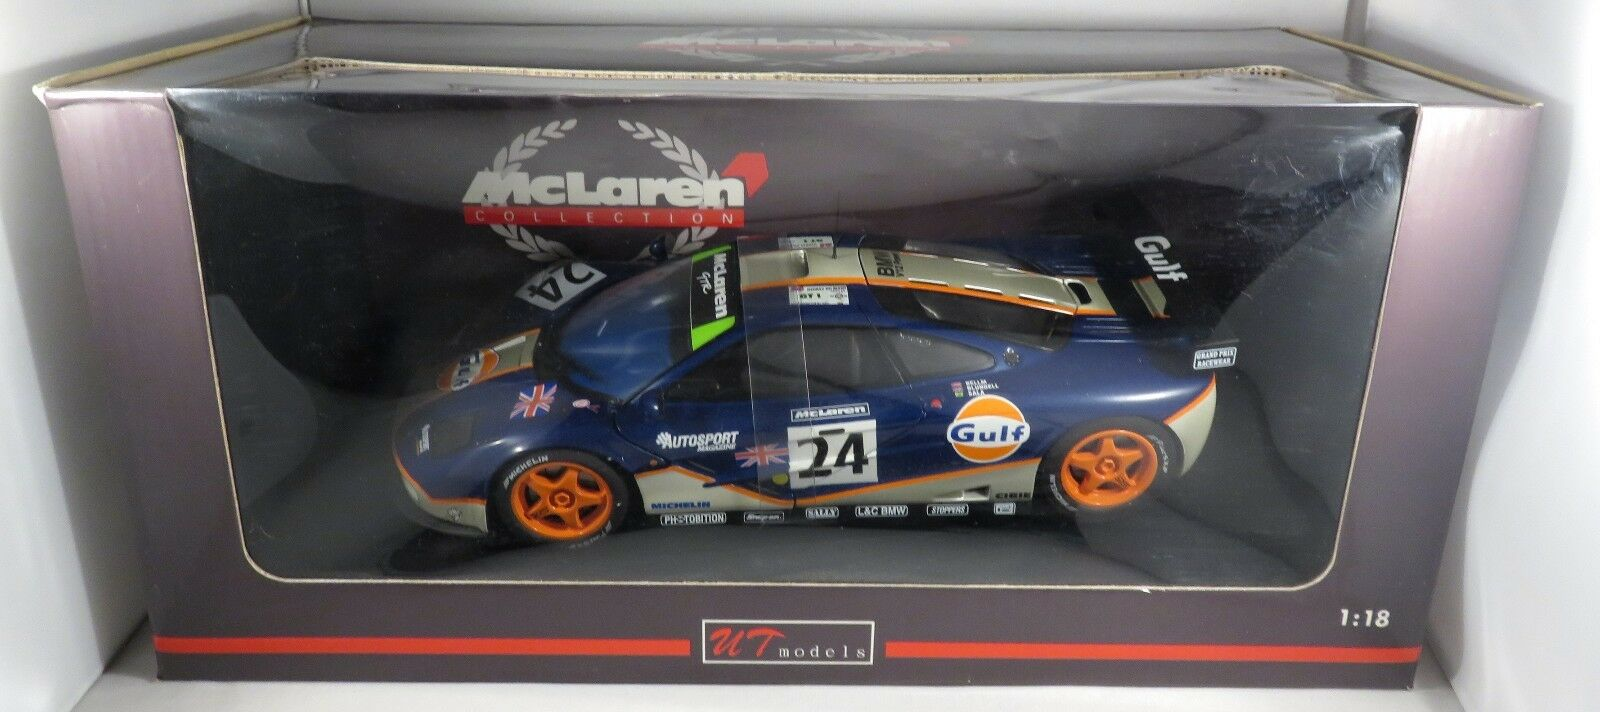 McLaren bmw f1 GTR gt1 bluendell Room Bellm Gulf gtc 4th Le Mans 1995 UT 1 18